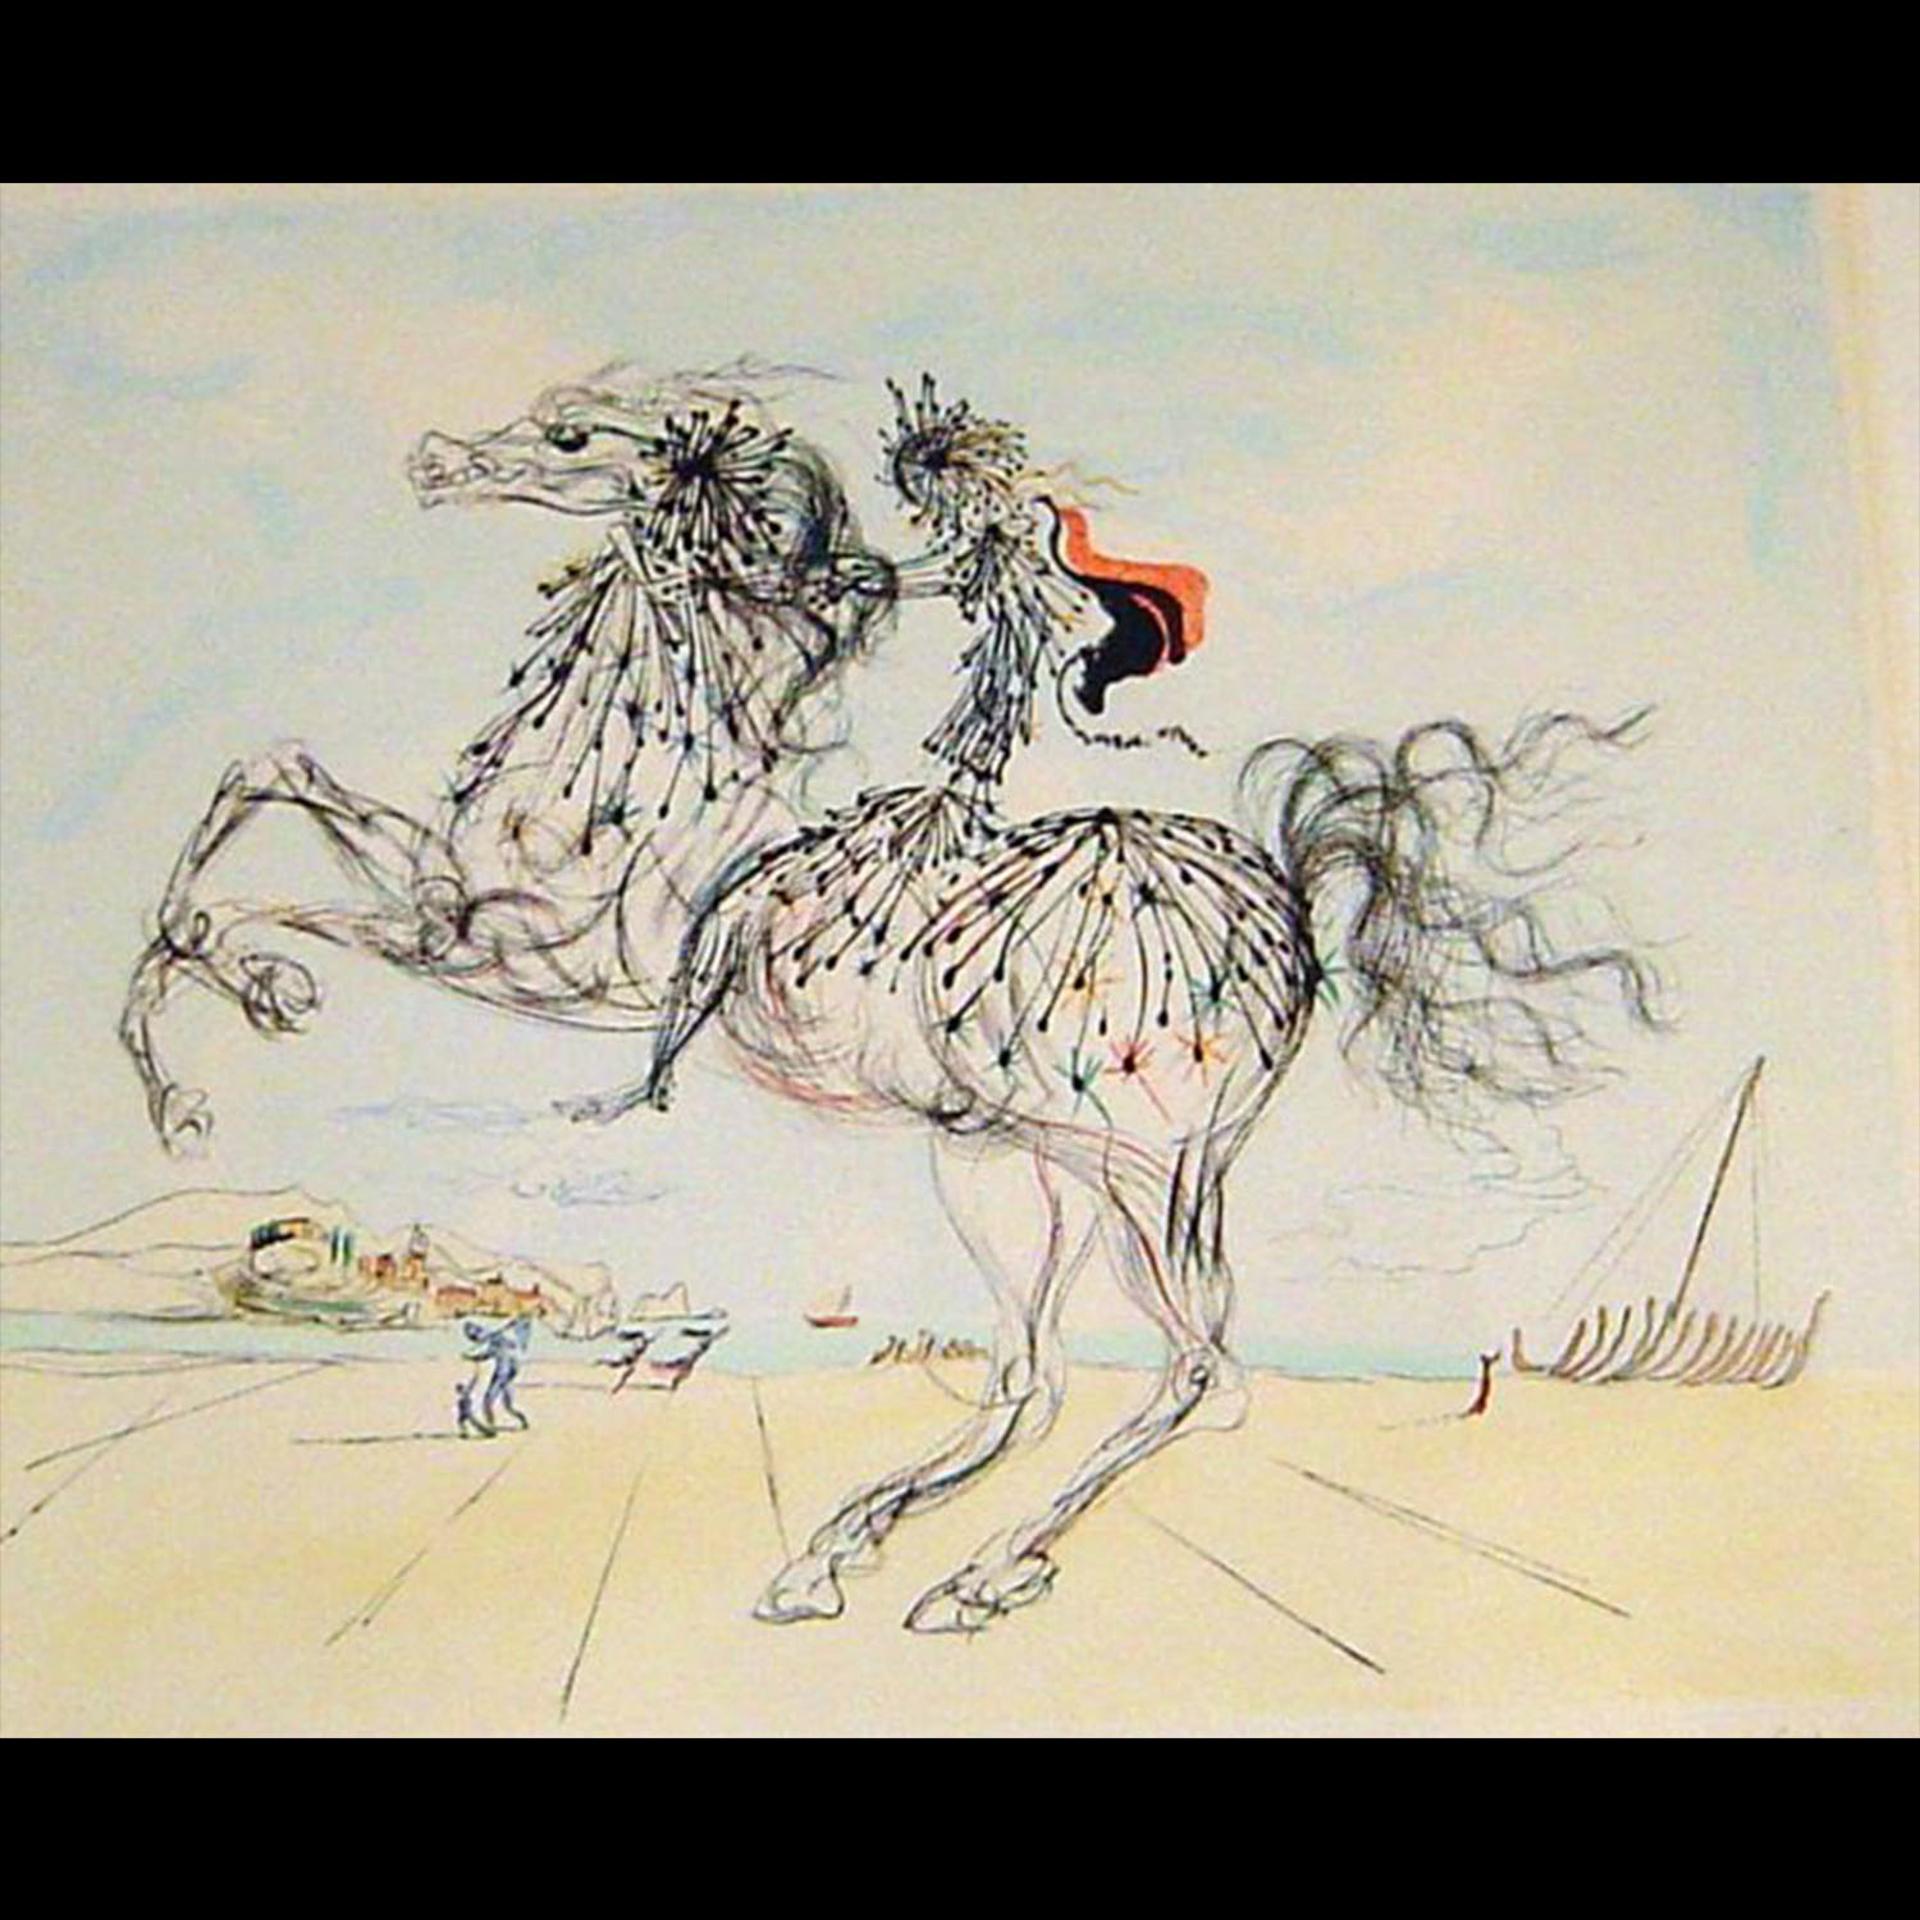 Chevauchee (Transparent Horse) by Salvador Dali